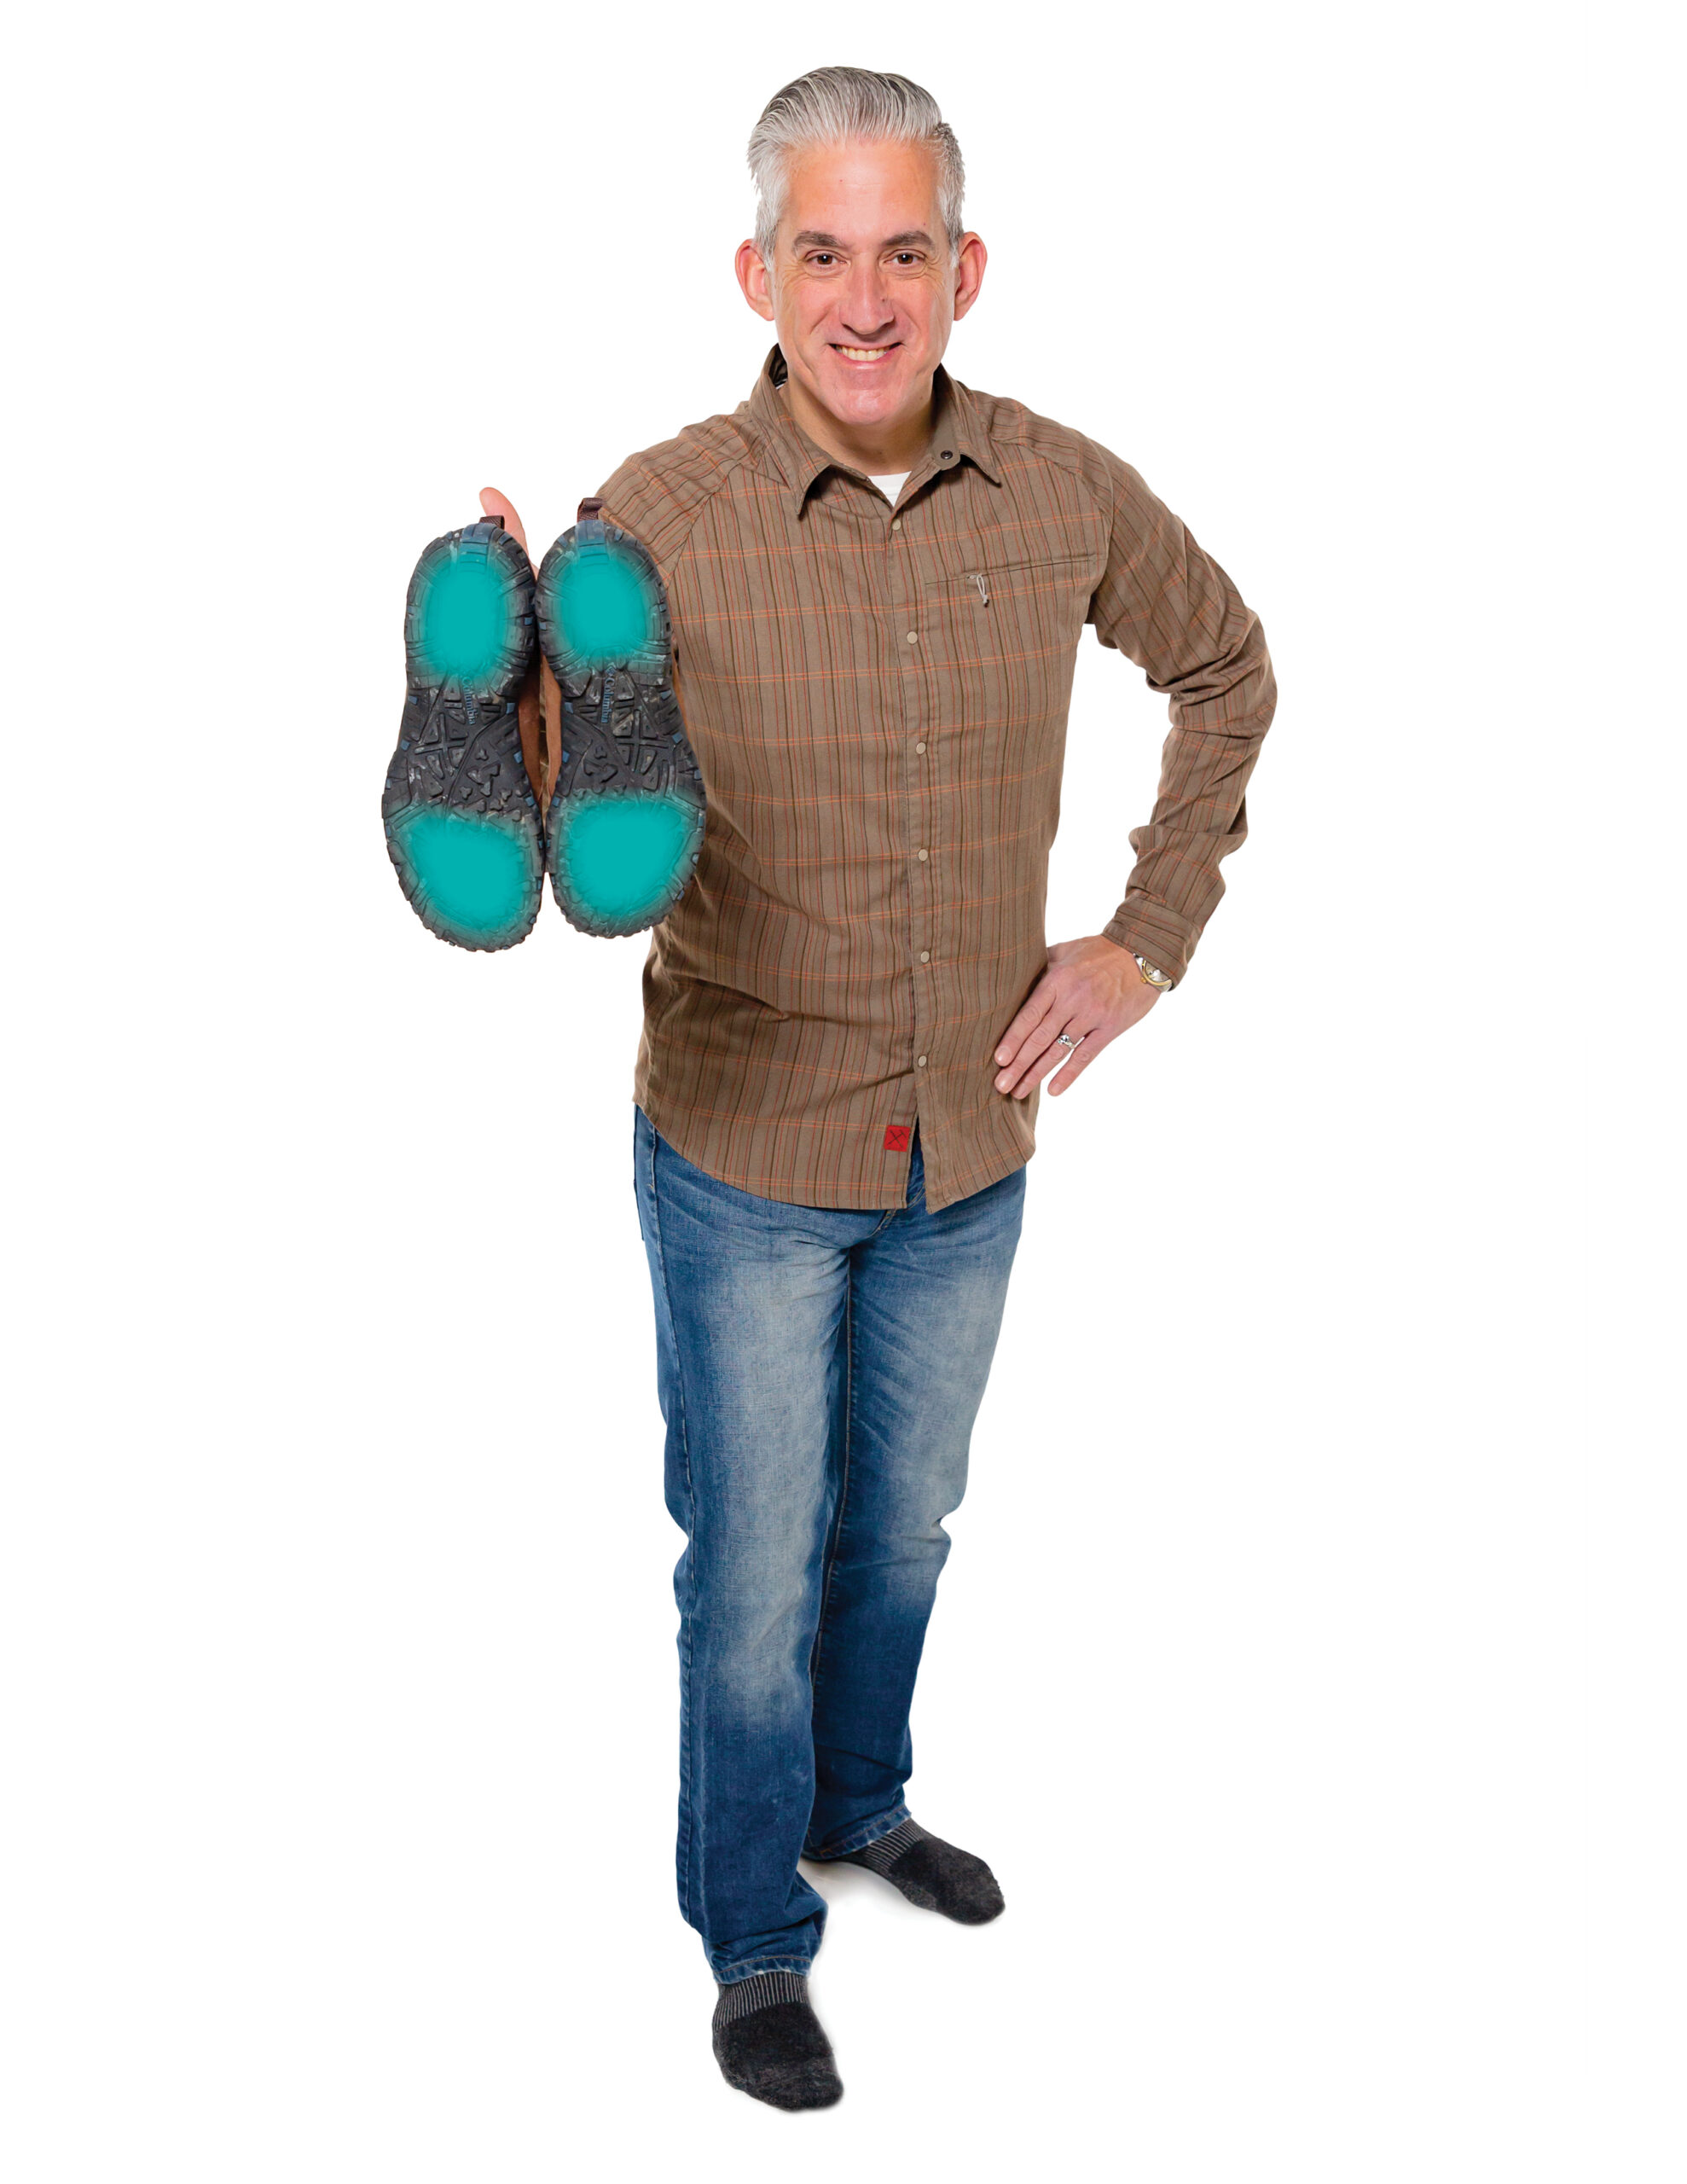 John Scott showing his sole